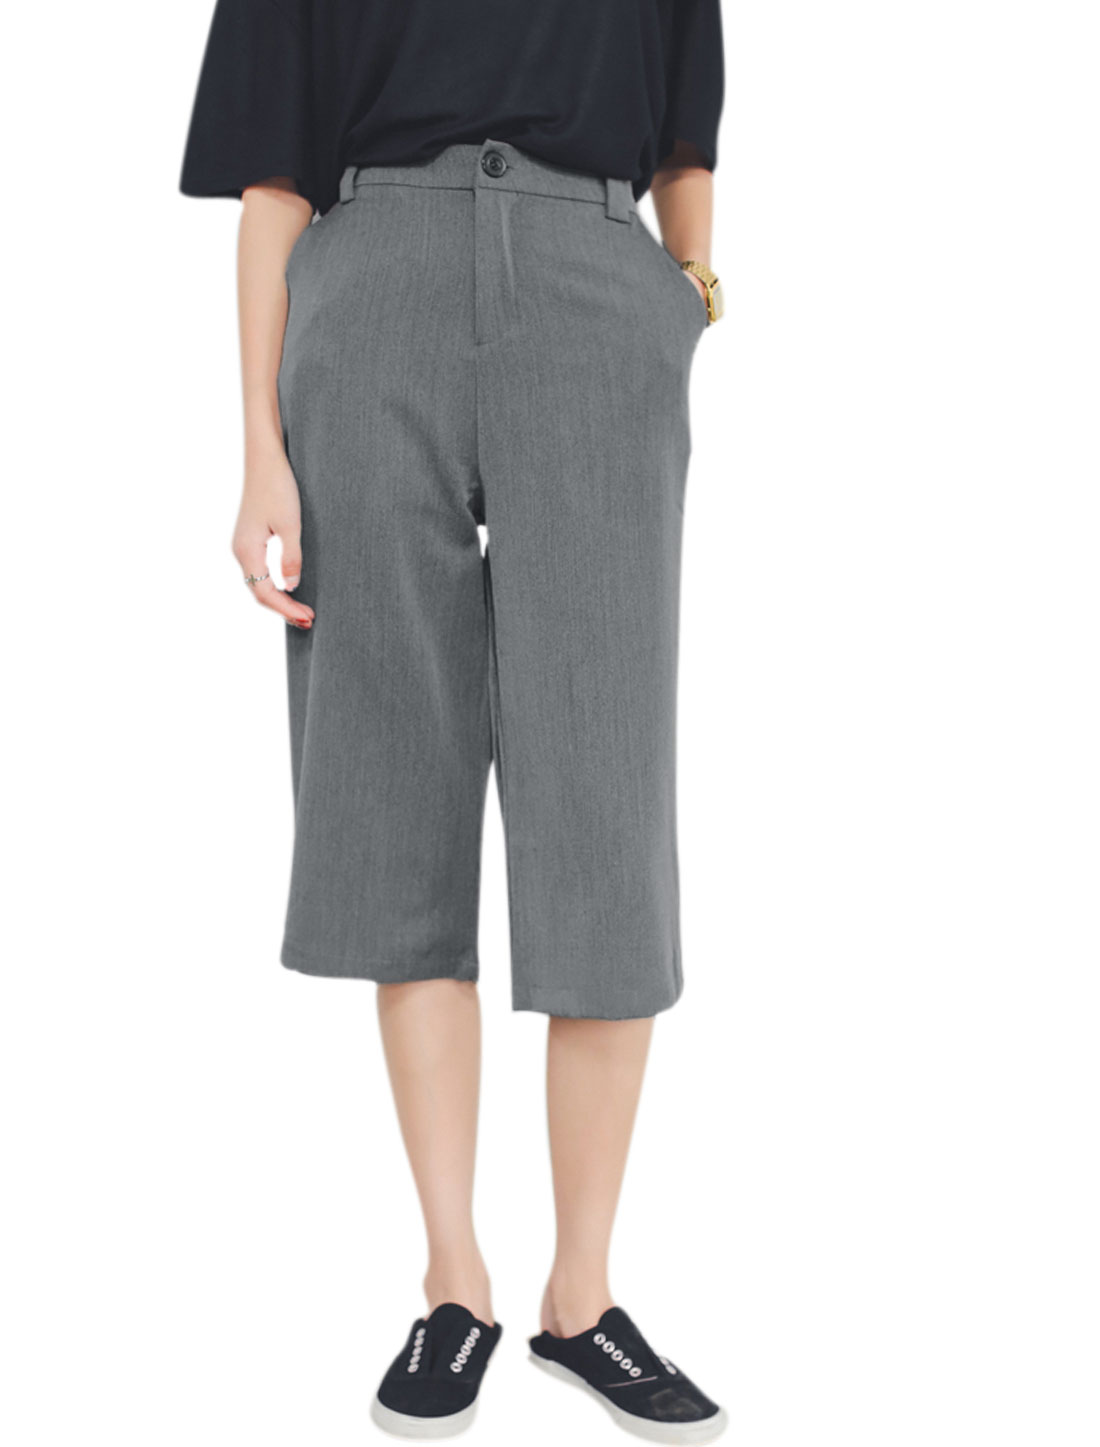 Women Elastic Waist Mid Rise Two Slant Pockets Capri Pants Gray M